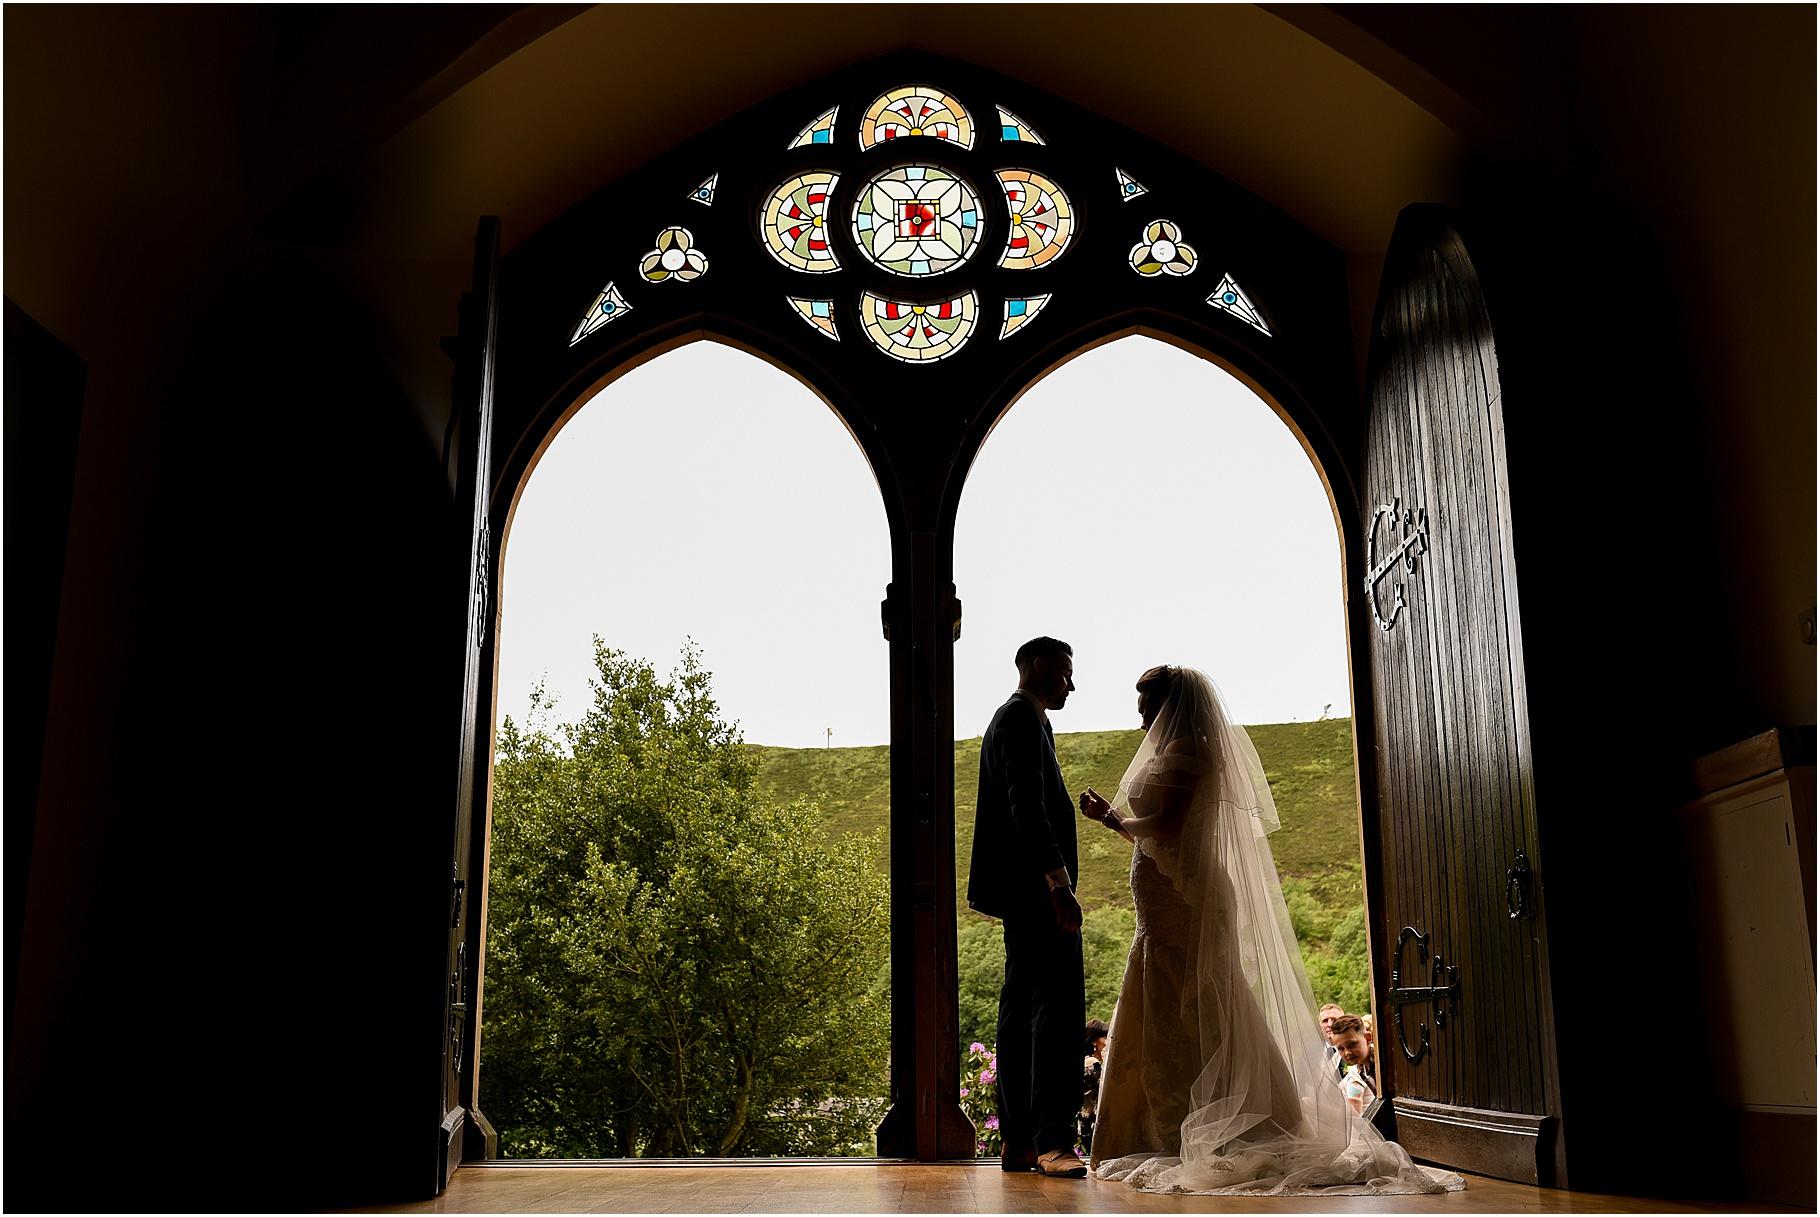 dan-wootton-photography-2017-weddings-198.jpg